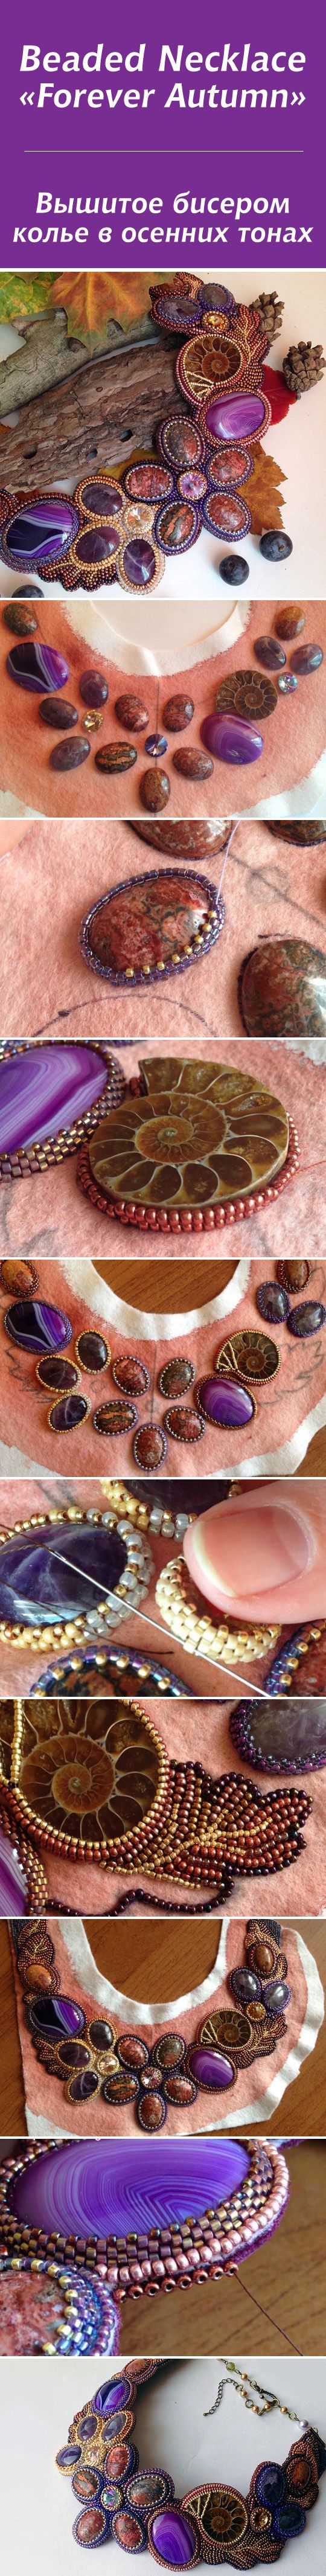 "Мастер-класс по изготовлению колье из бисера ""Forever Autumn"" #beadwork"